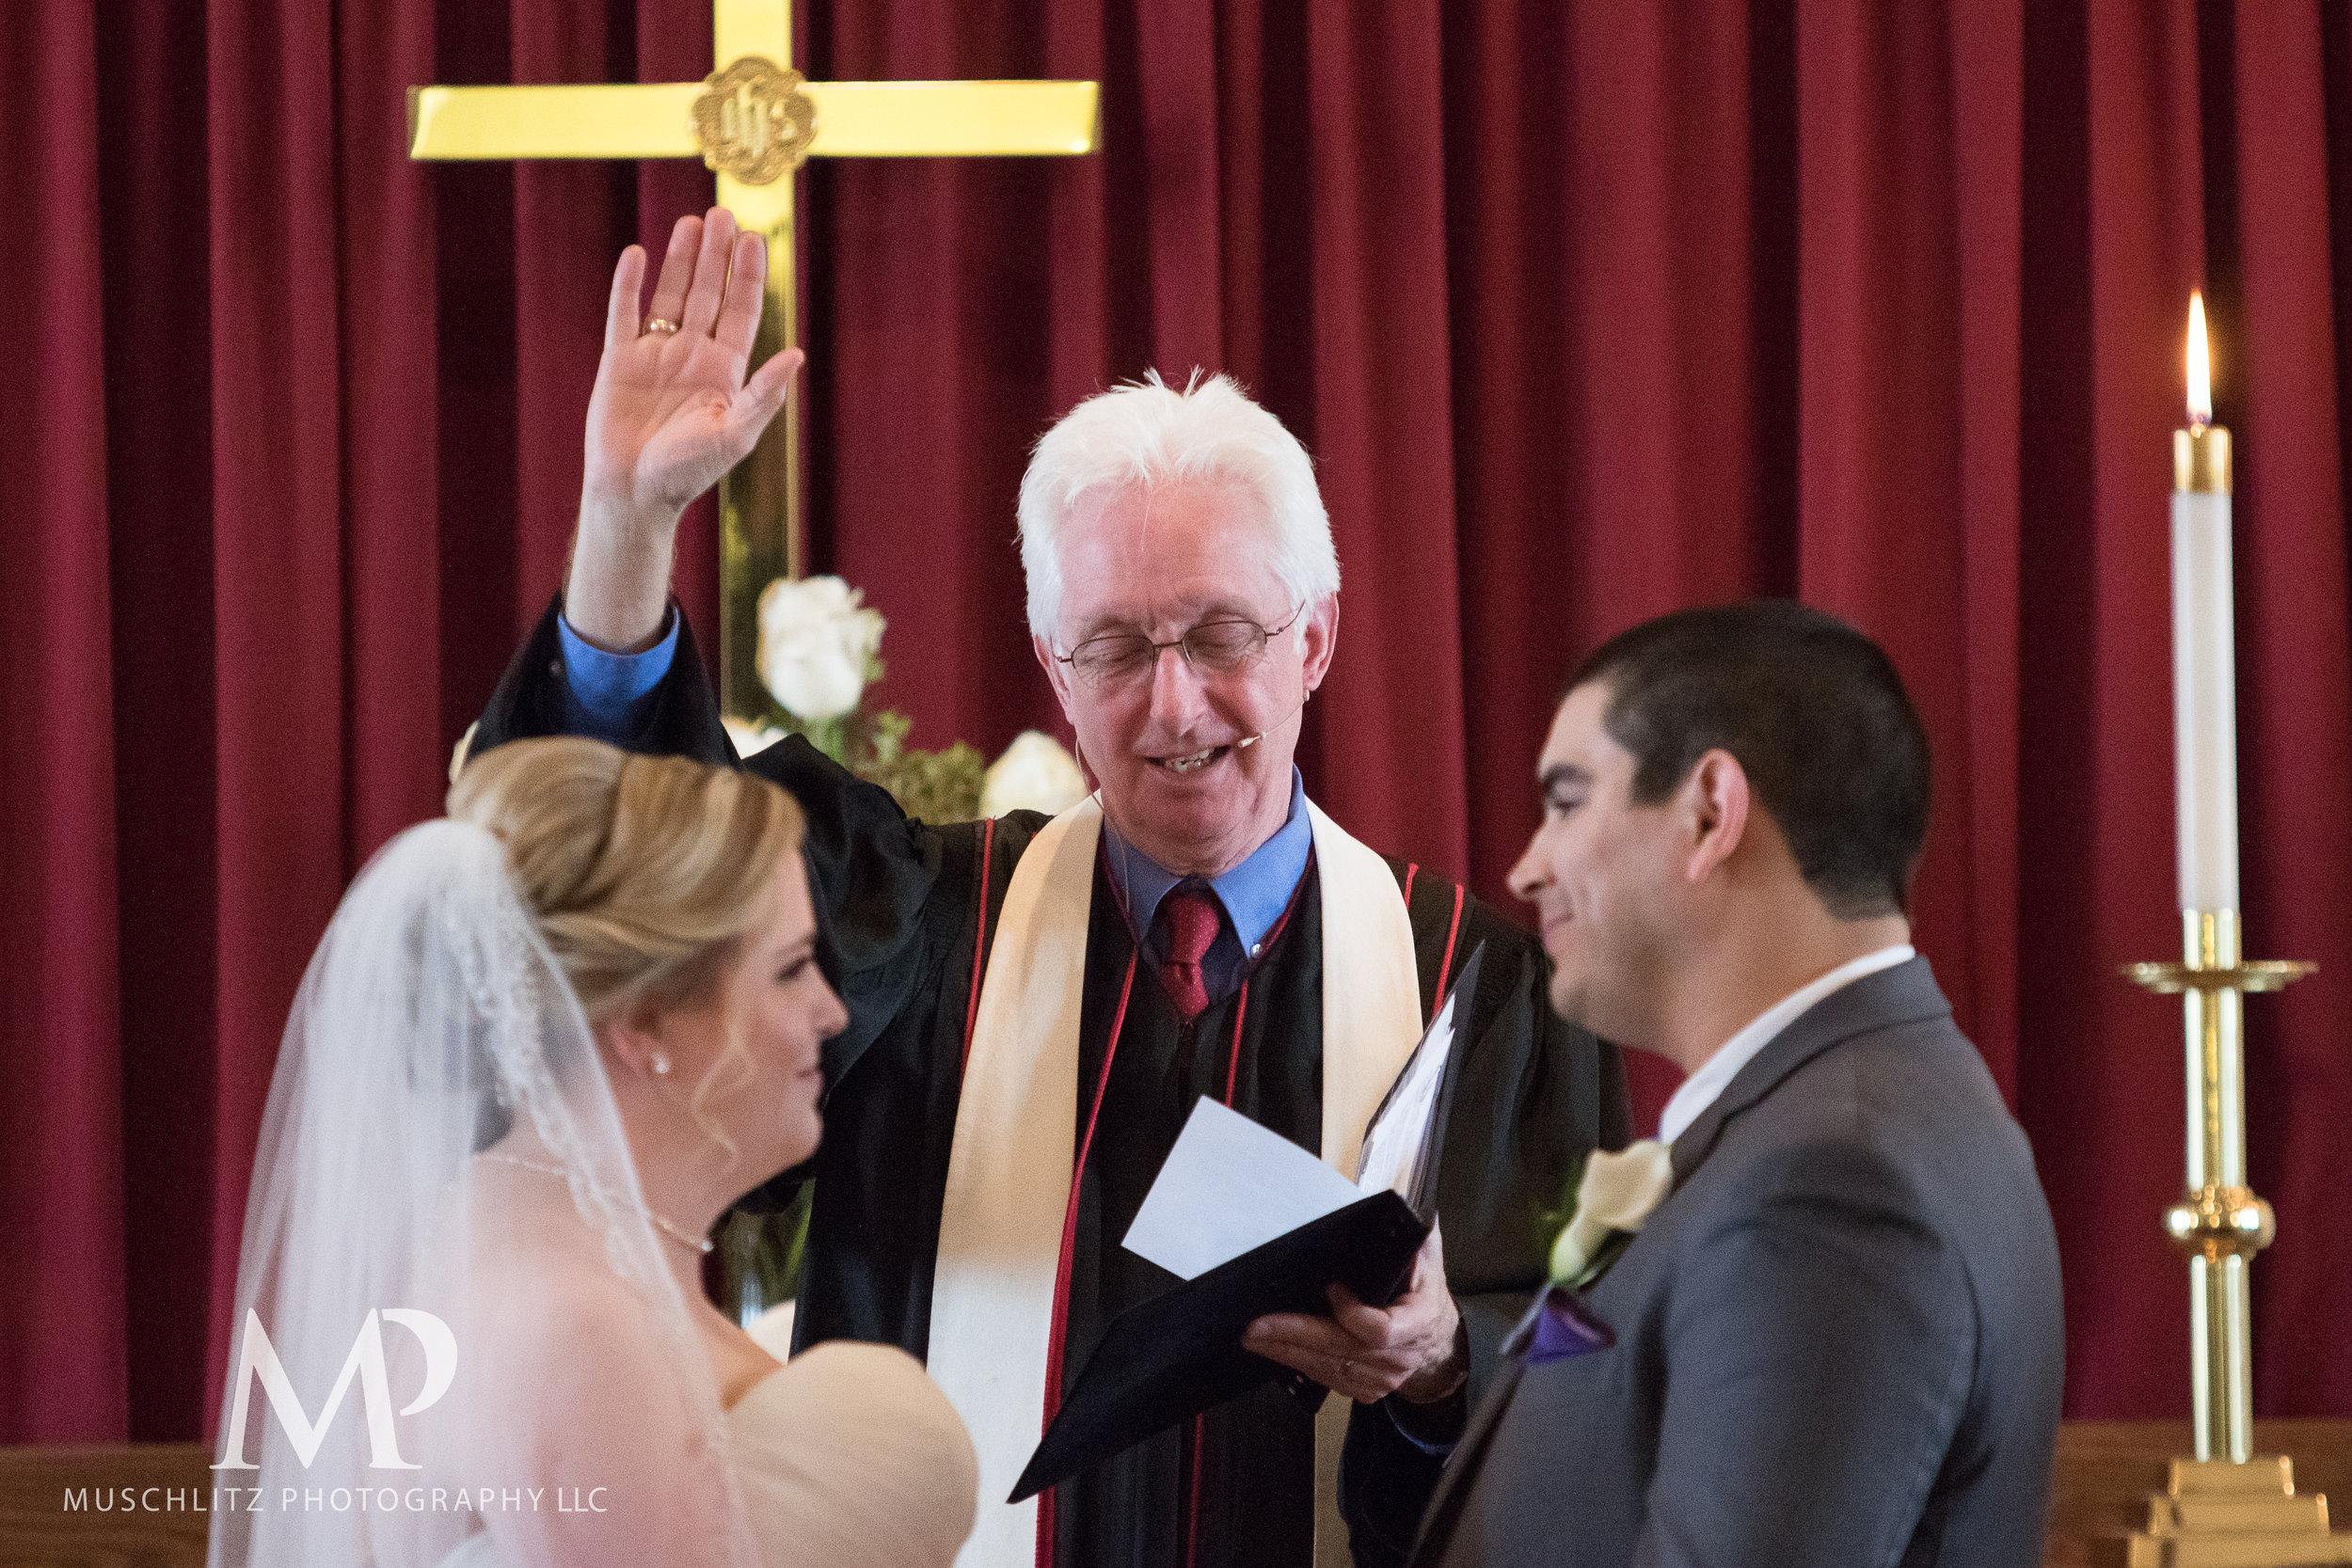 dublin-community-church-wedding-columbus-ohio-muschlitz-photography-056.JPG